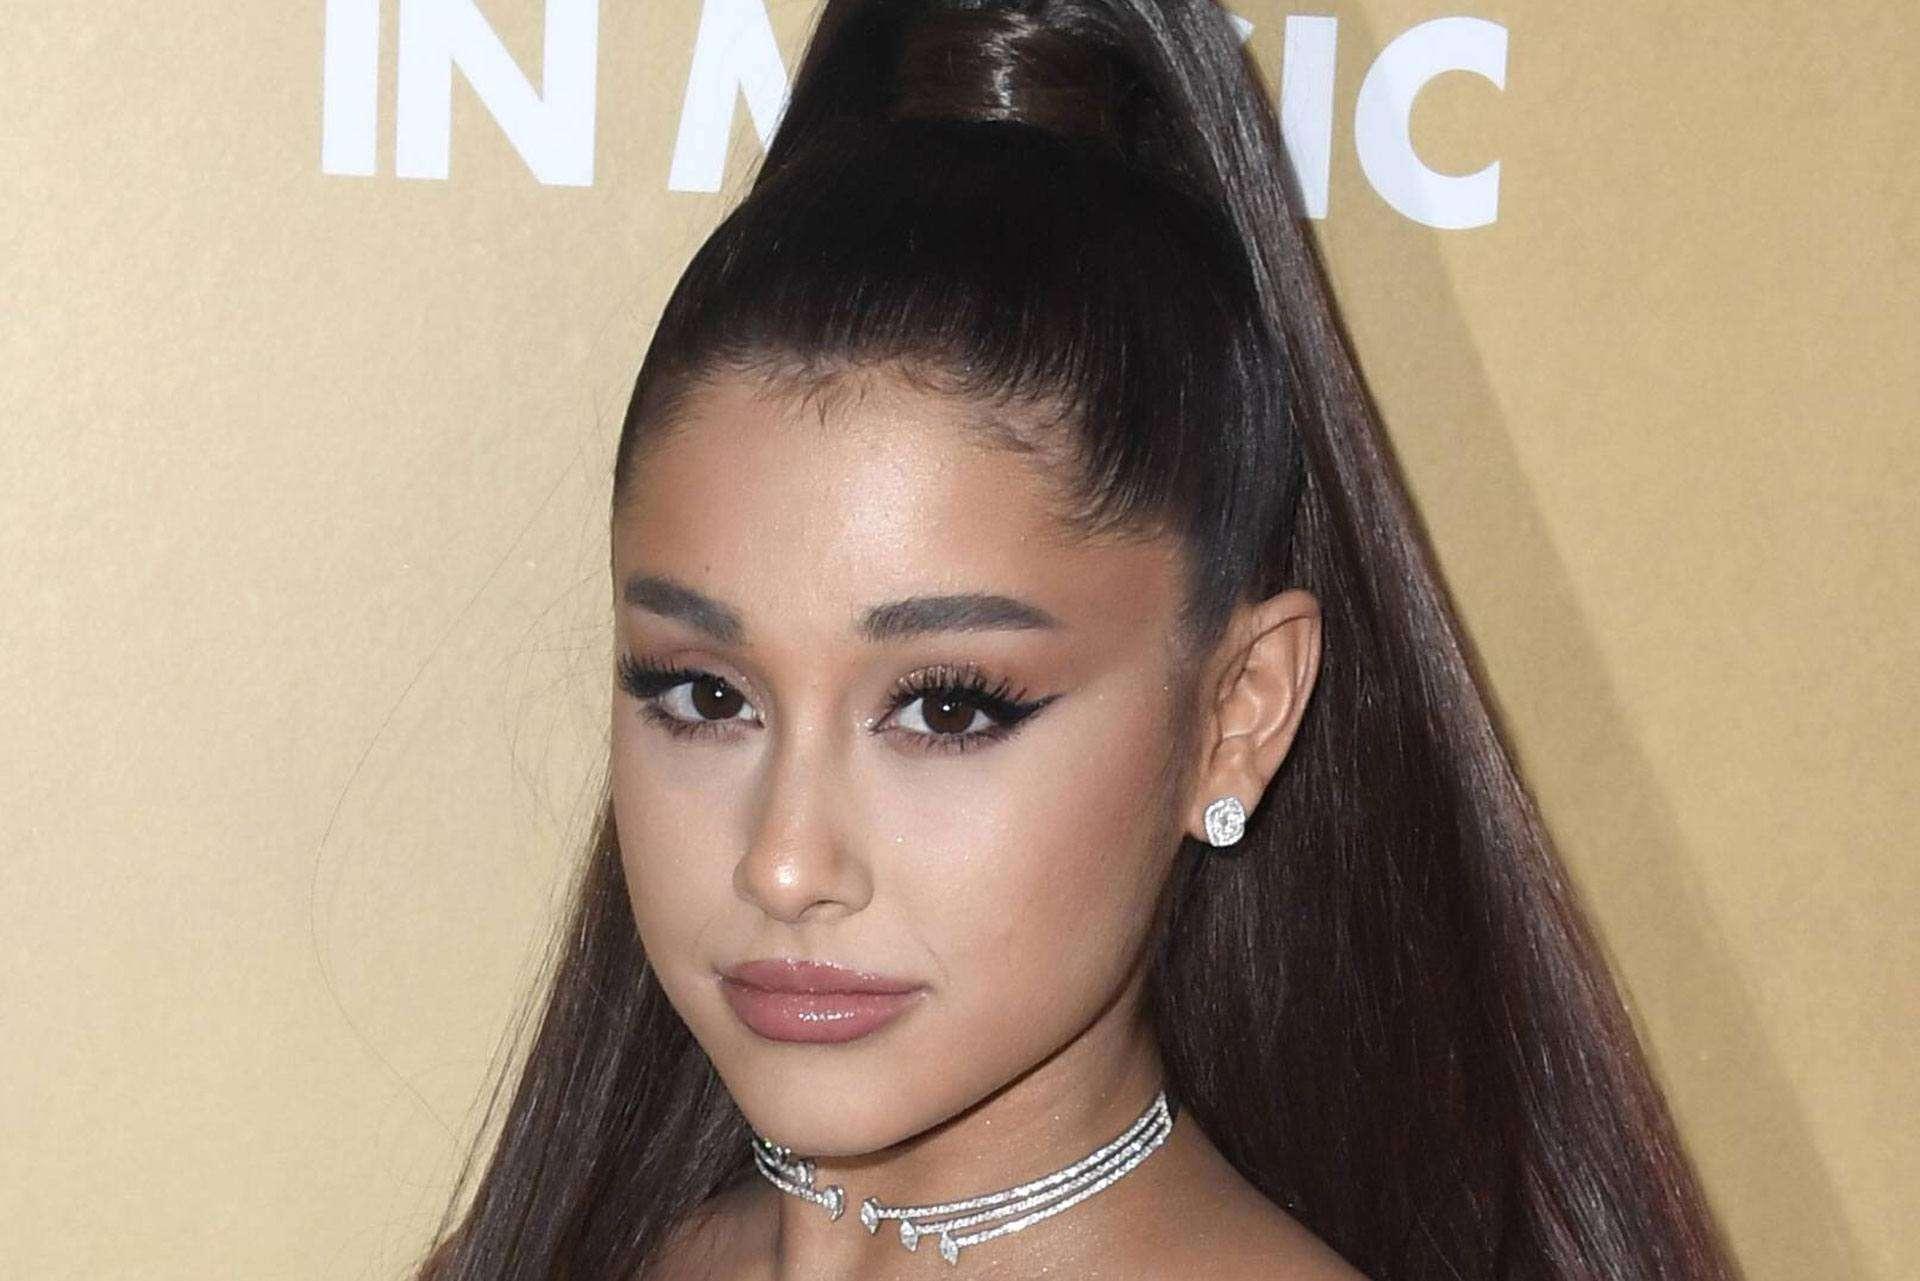 Ariana Grande. Foto: Imagespace/ Imago/ Mediapunch